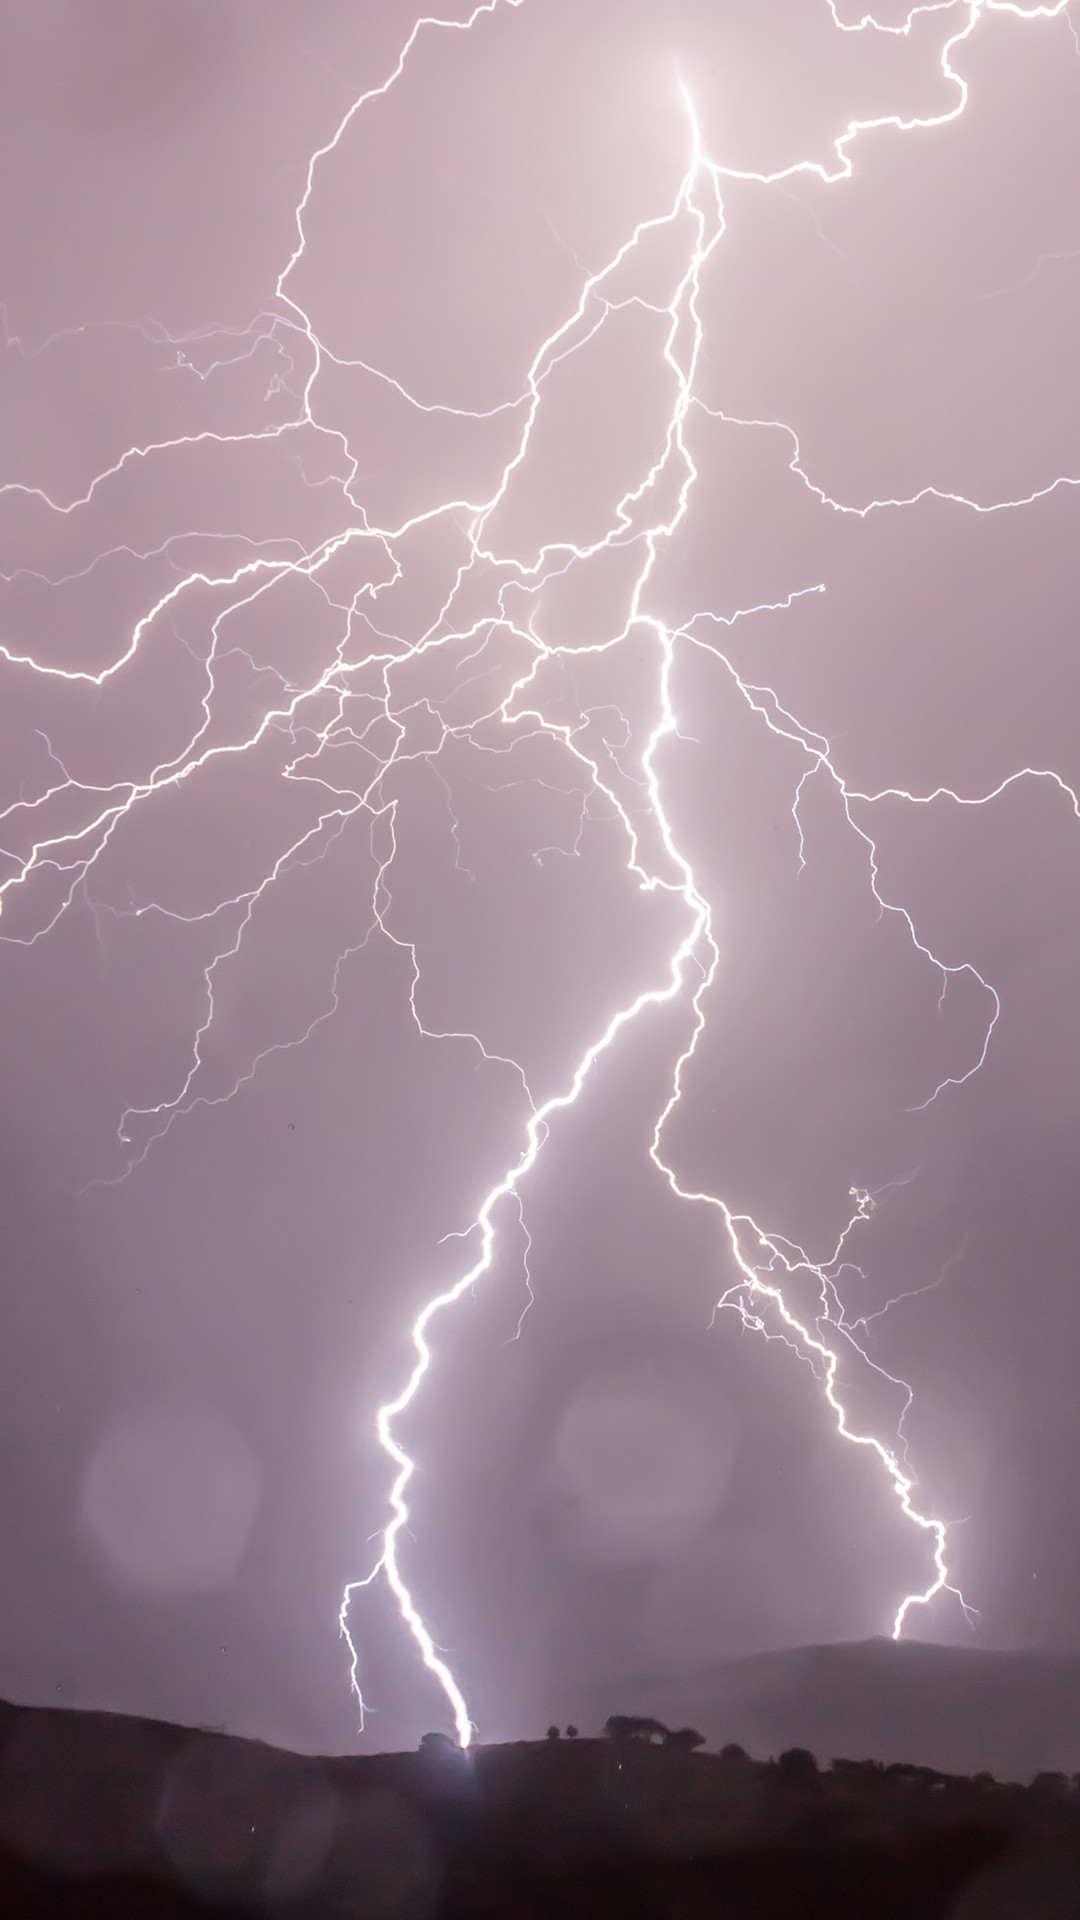 Res: 1080x1920, Lightning Strikes Phone Wallpaper